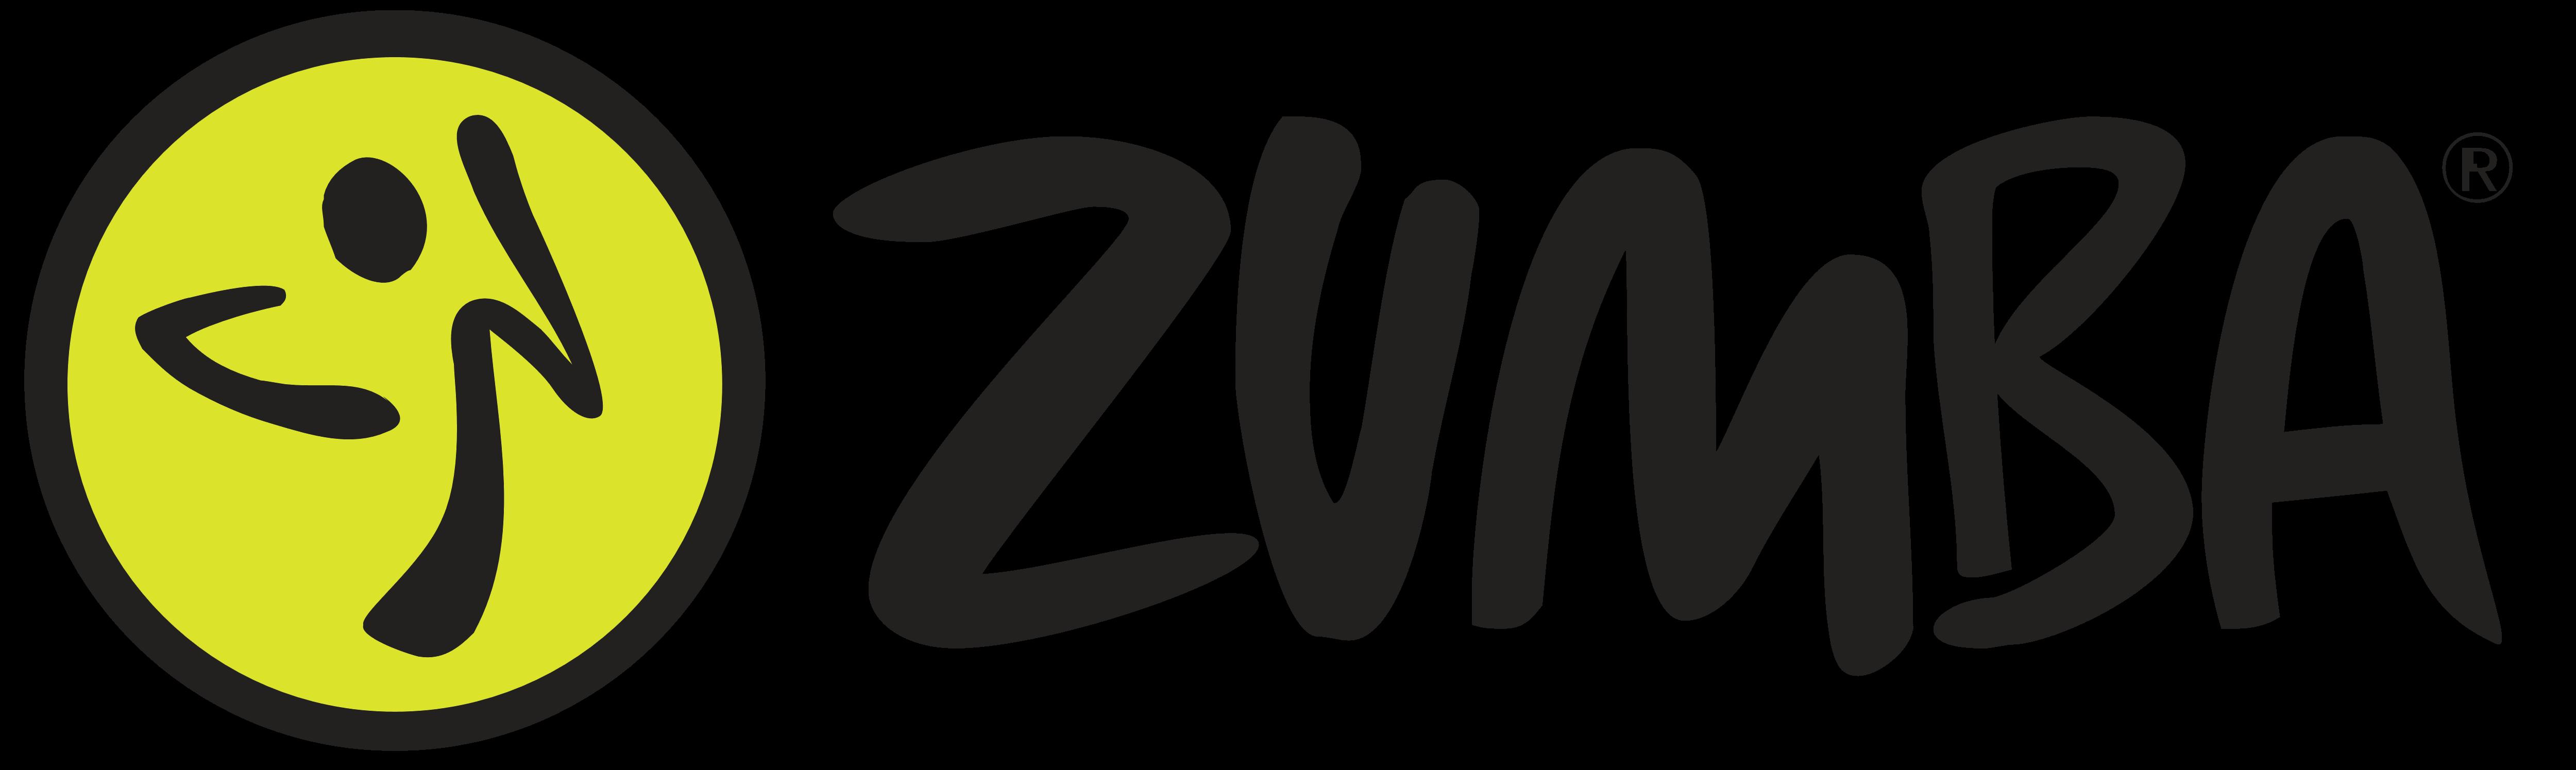 Zumba Fitness.